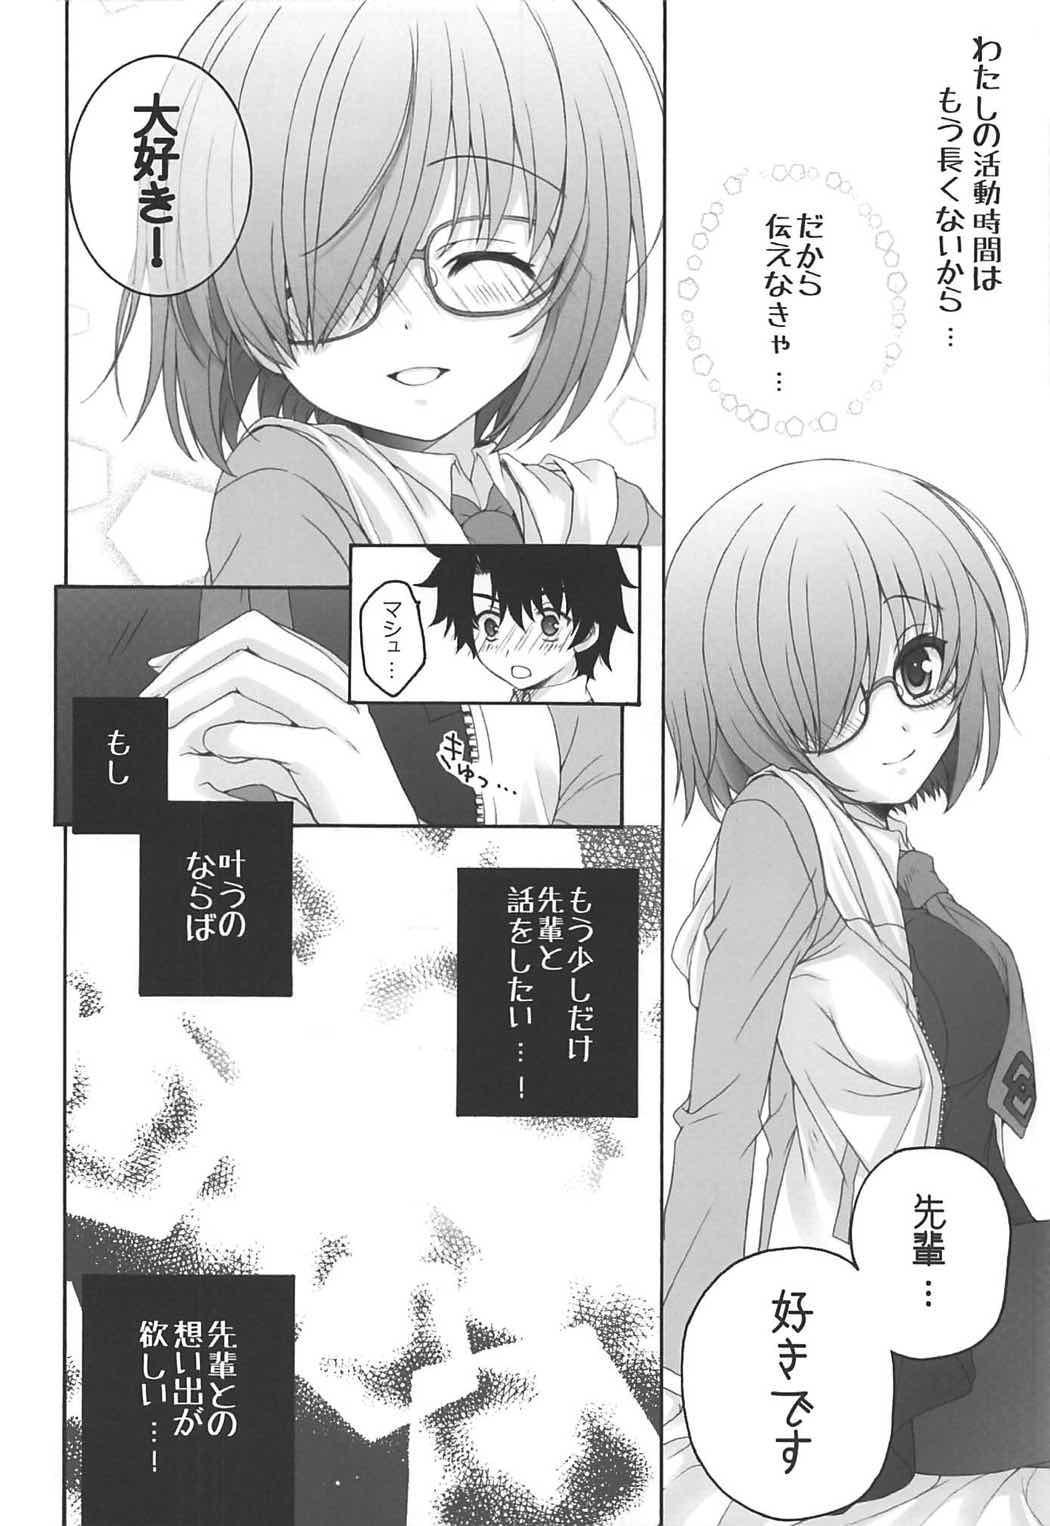 (COMIC1☆11) [Pyonpyororin (Akoko.)] - 1 day ago - (Fate/Grand Order) 6